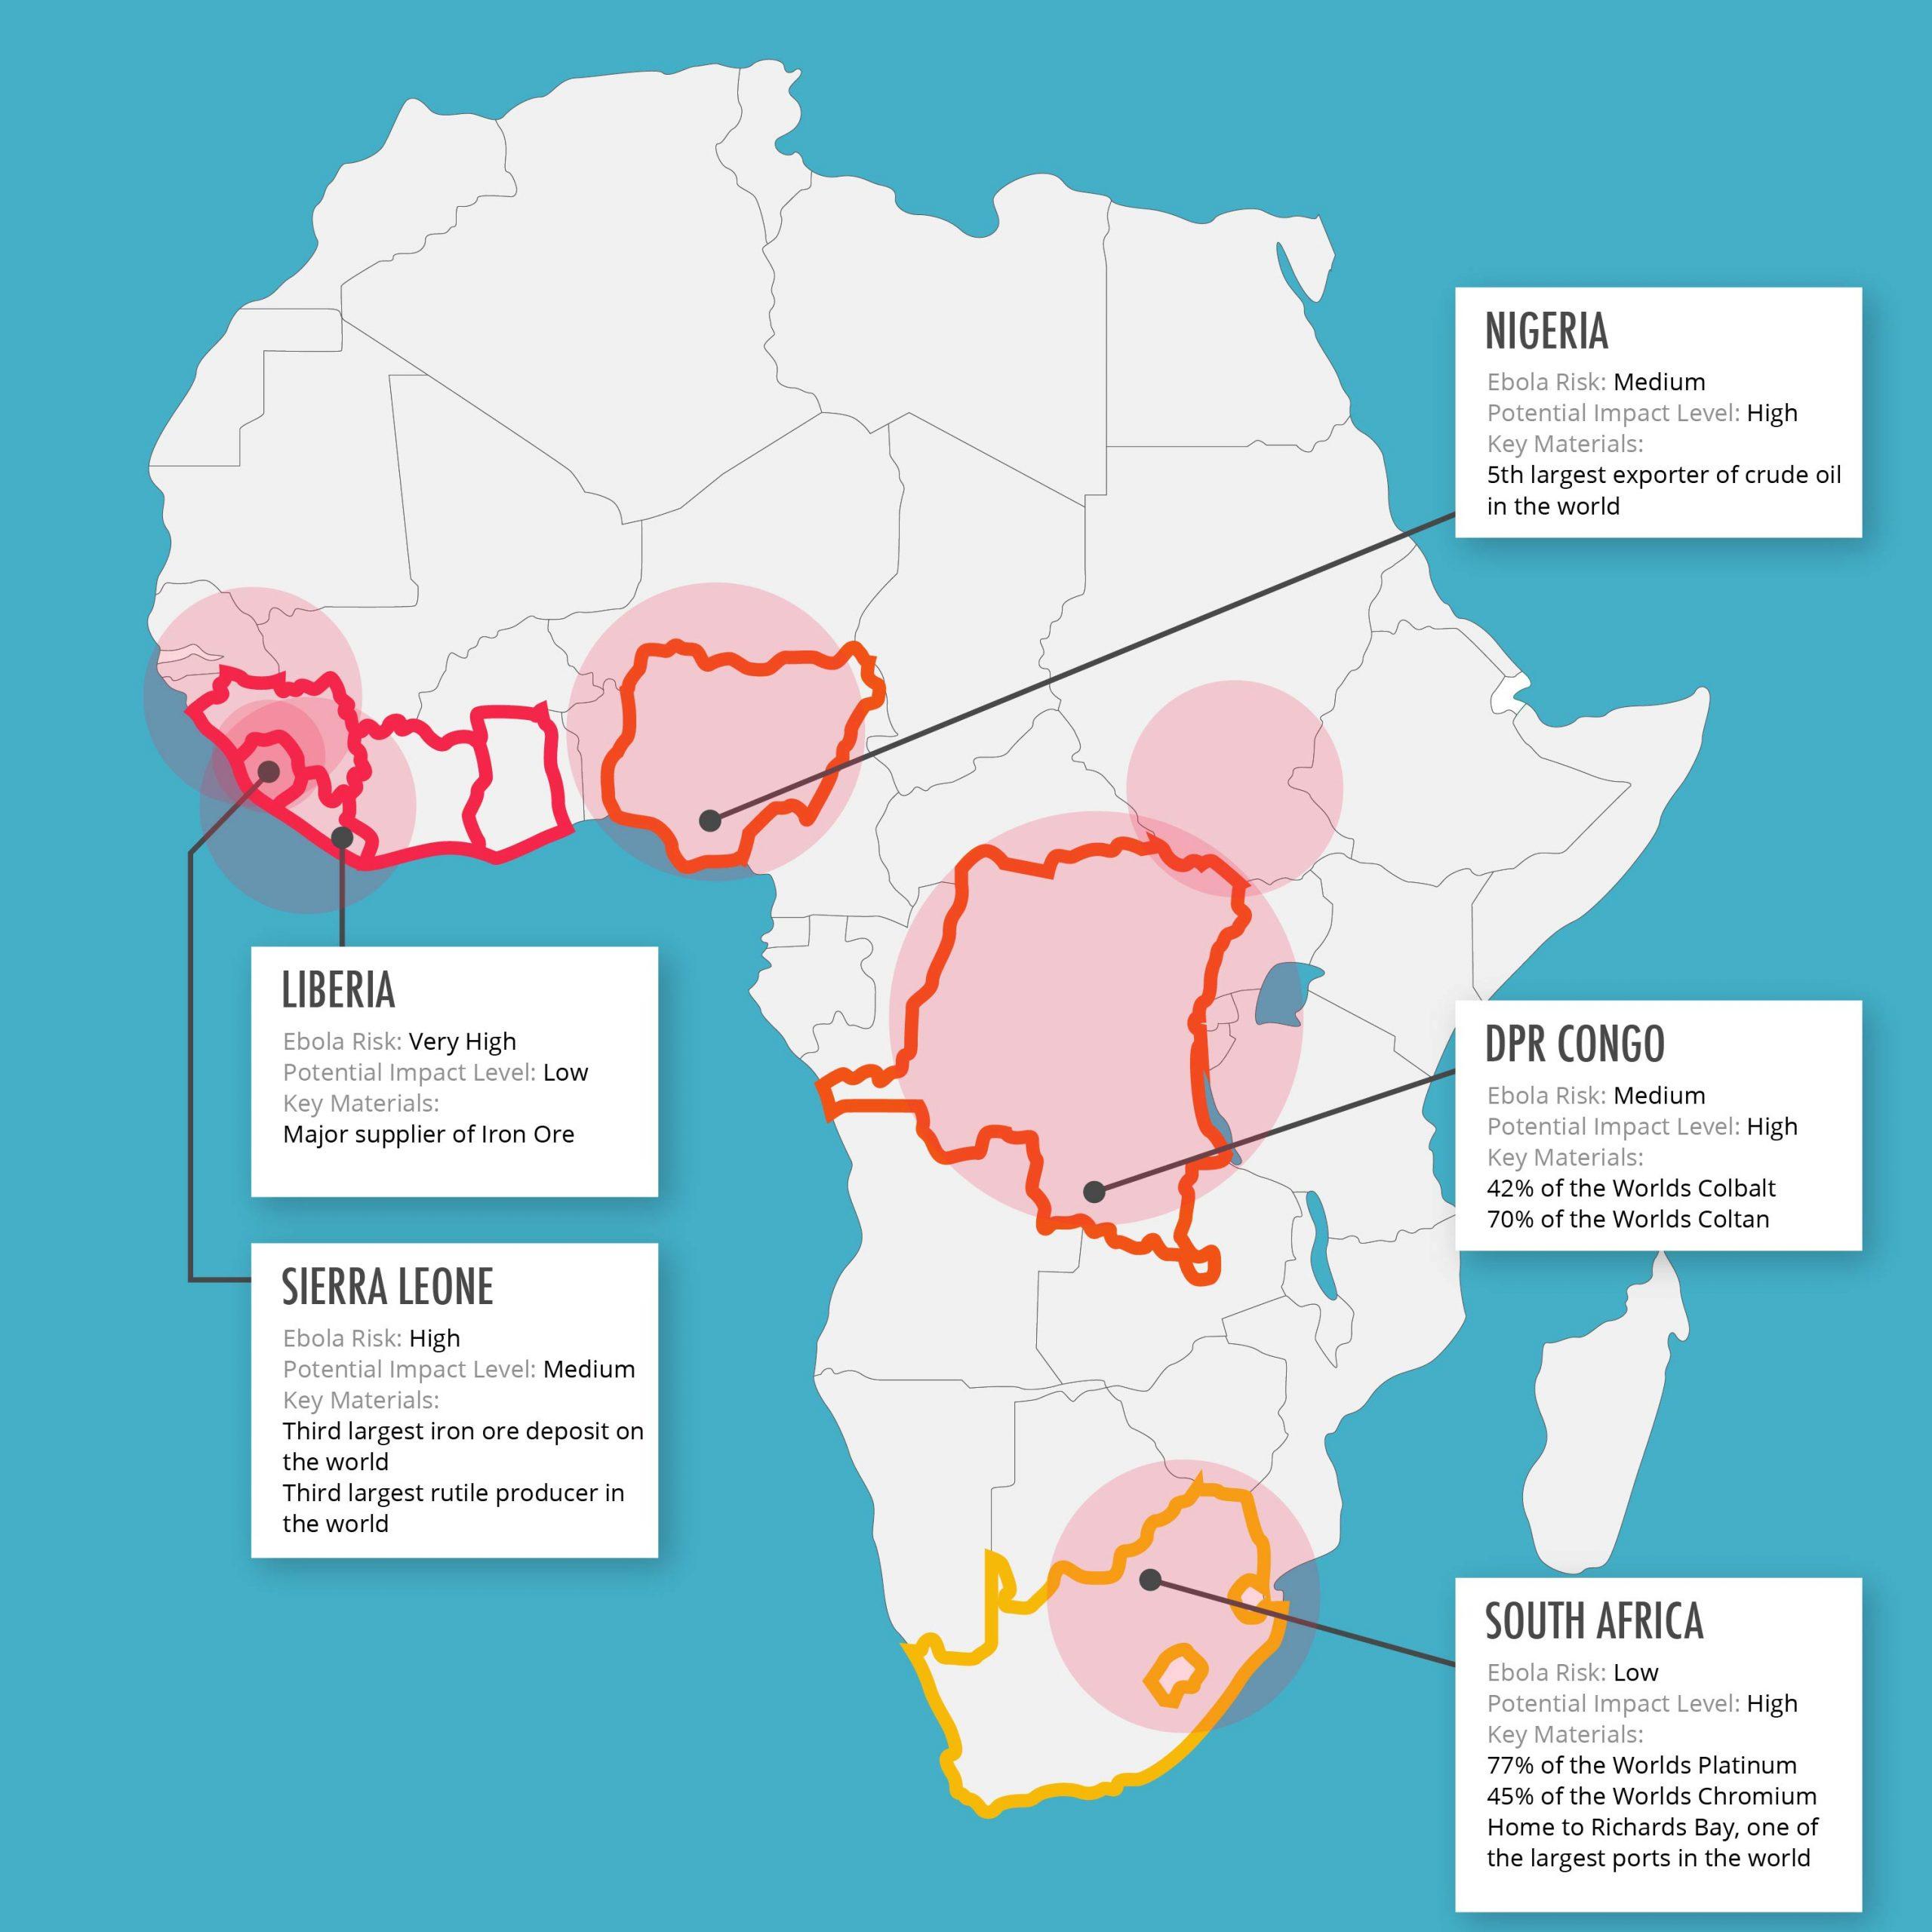 Africa_EBOLA